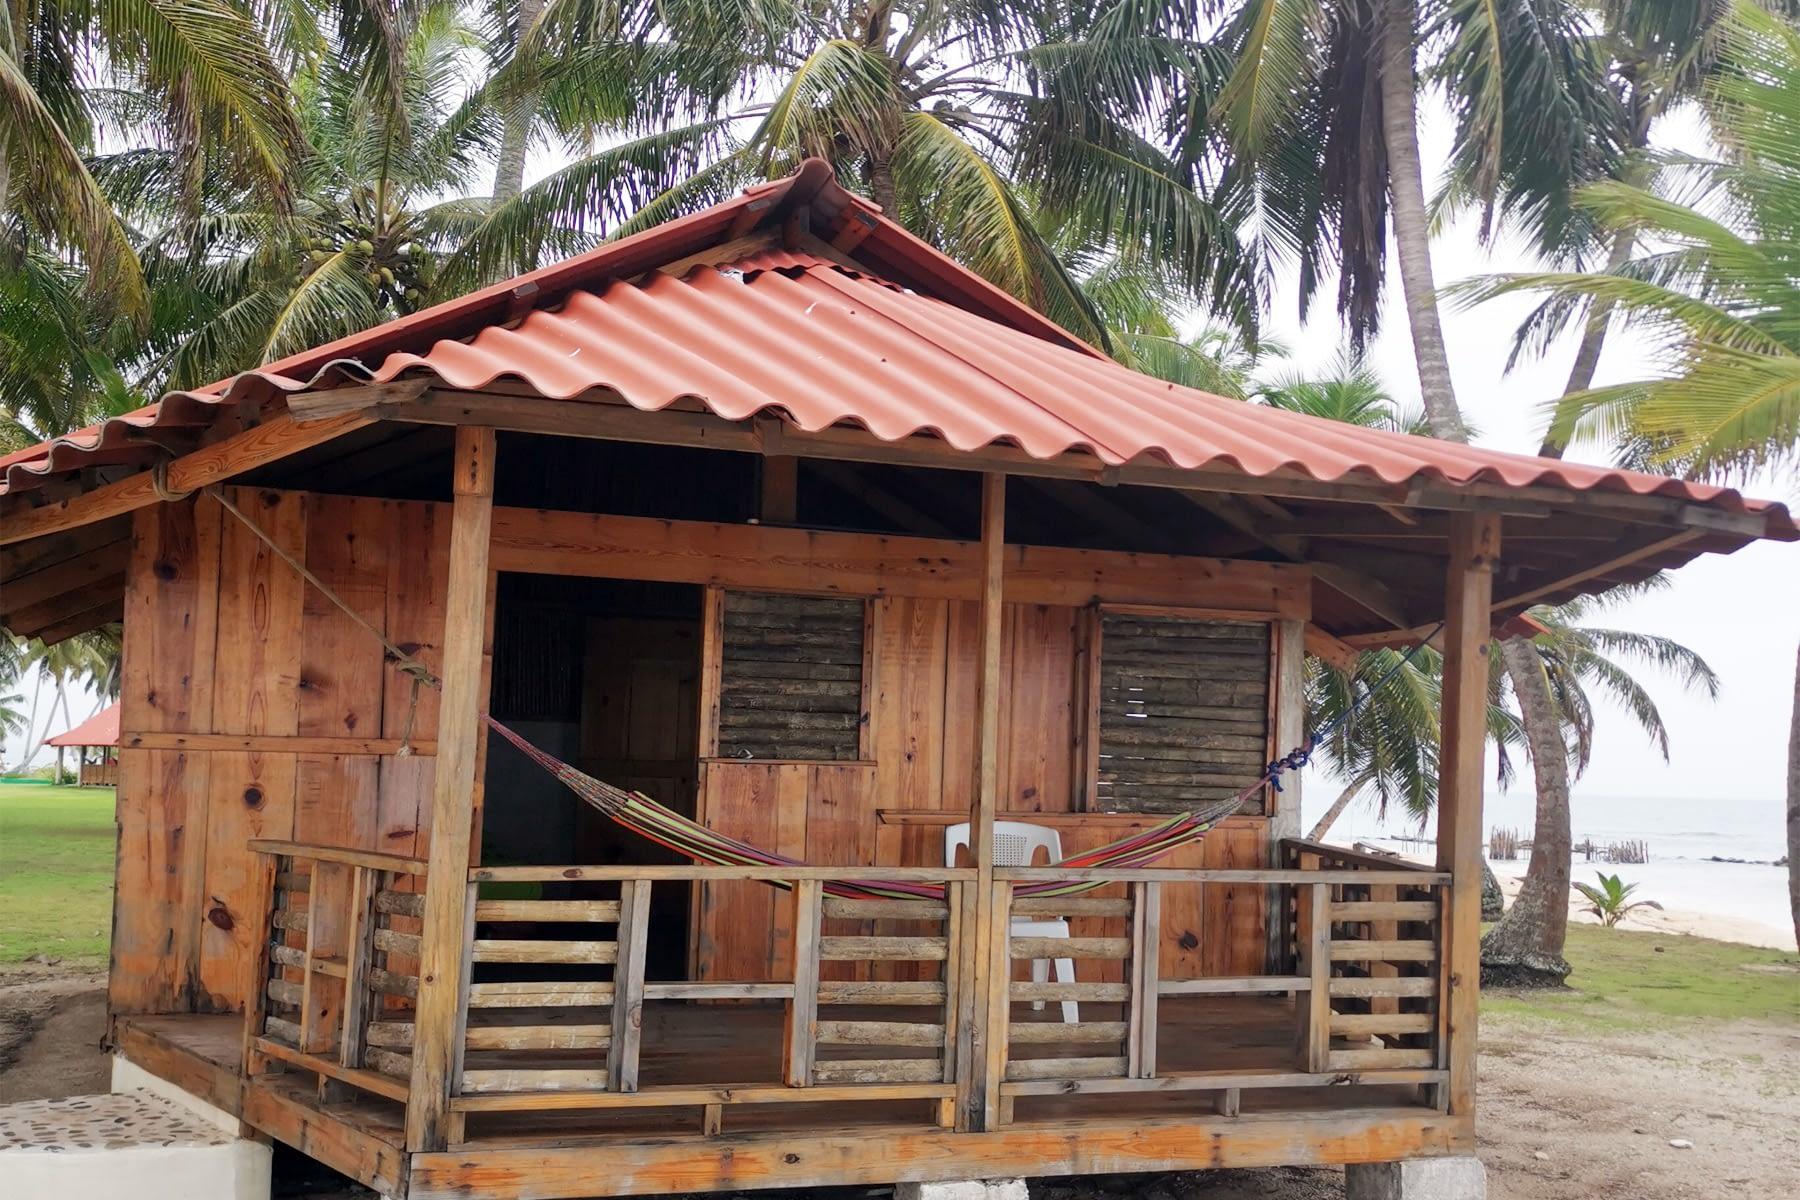 Cabaña en la isla Iggodub